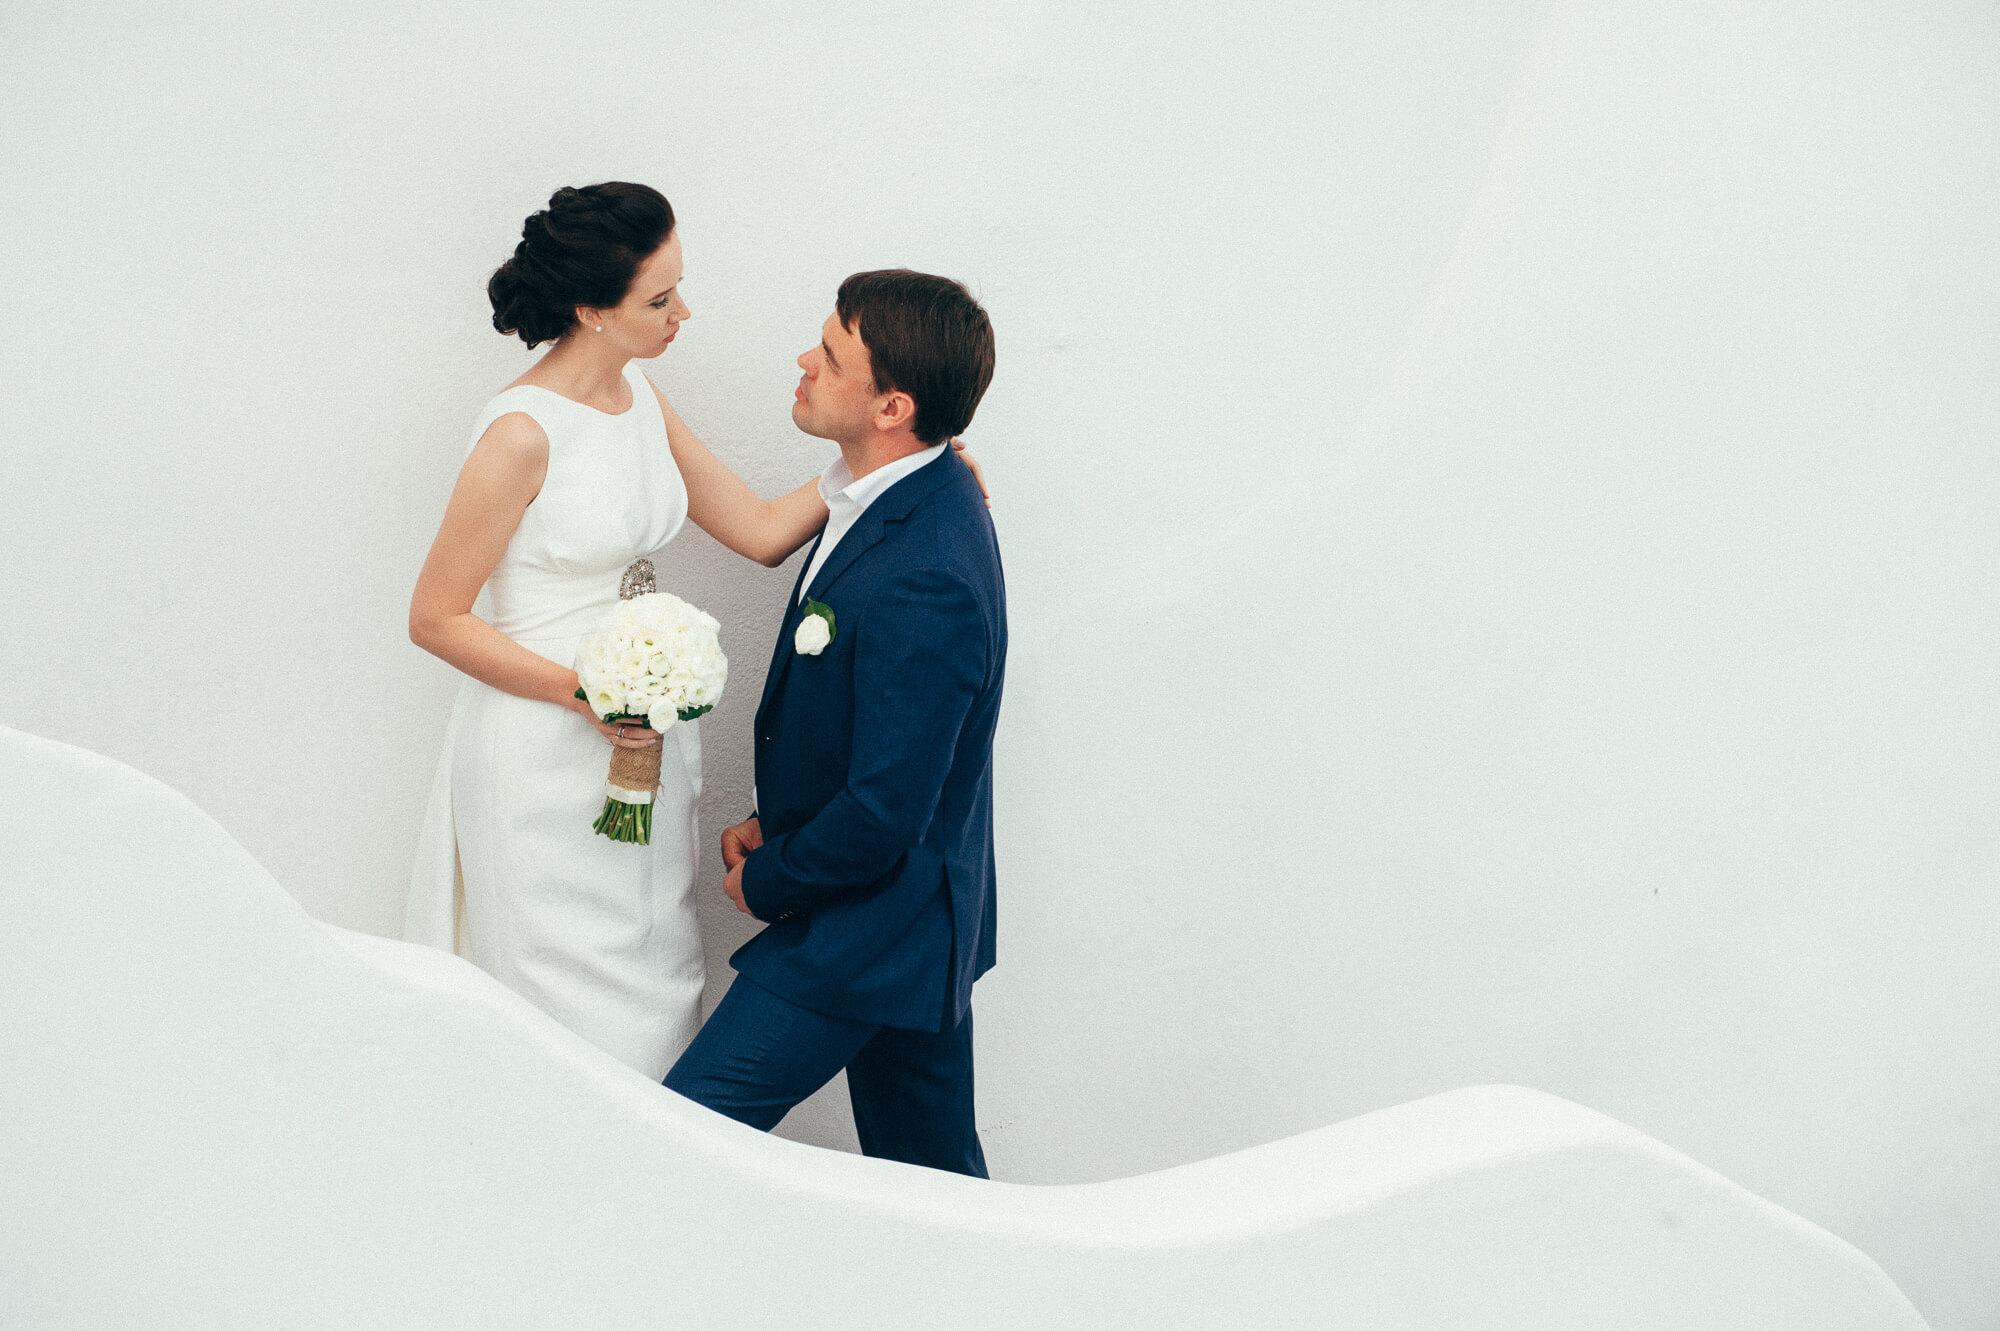 manes-wedding-photographer-greece-126